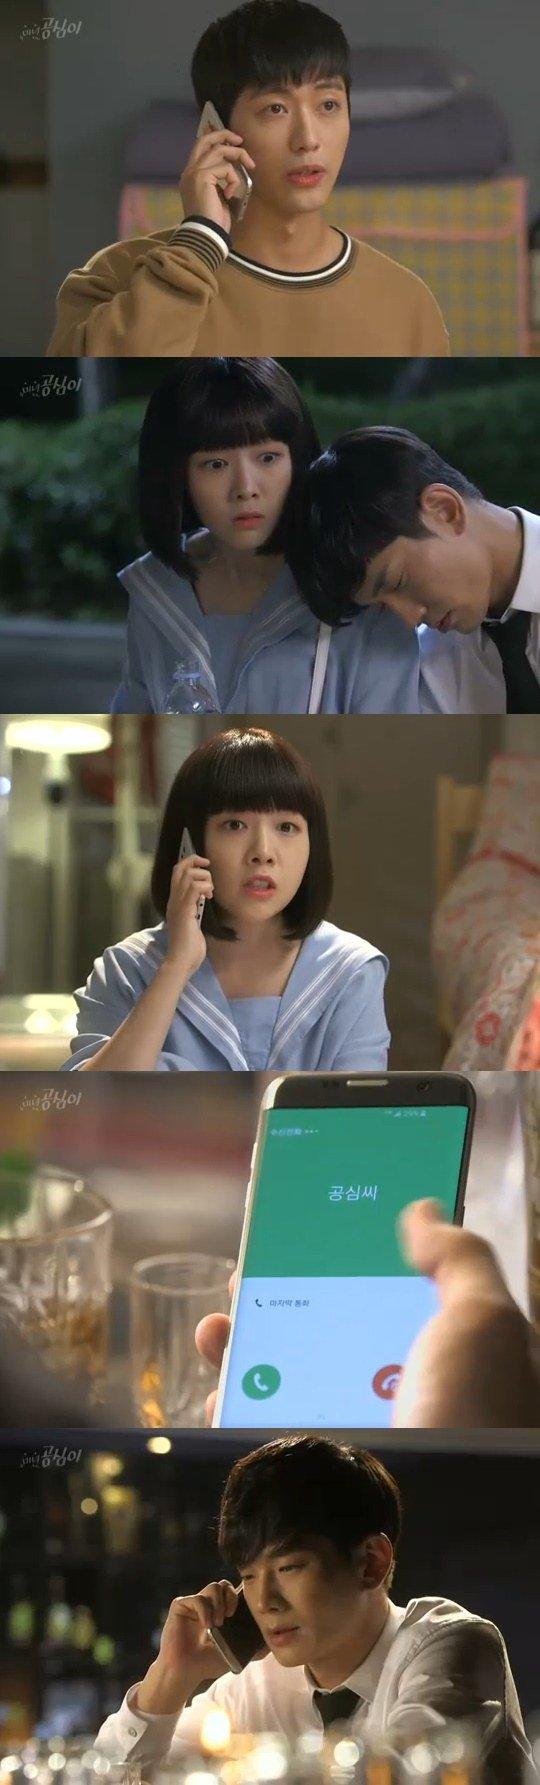 "[Spoiler] ""Beautiful Gong Shim"" Min-ah, gets help from Nam Goong-min while comforting On Joo-wan"